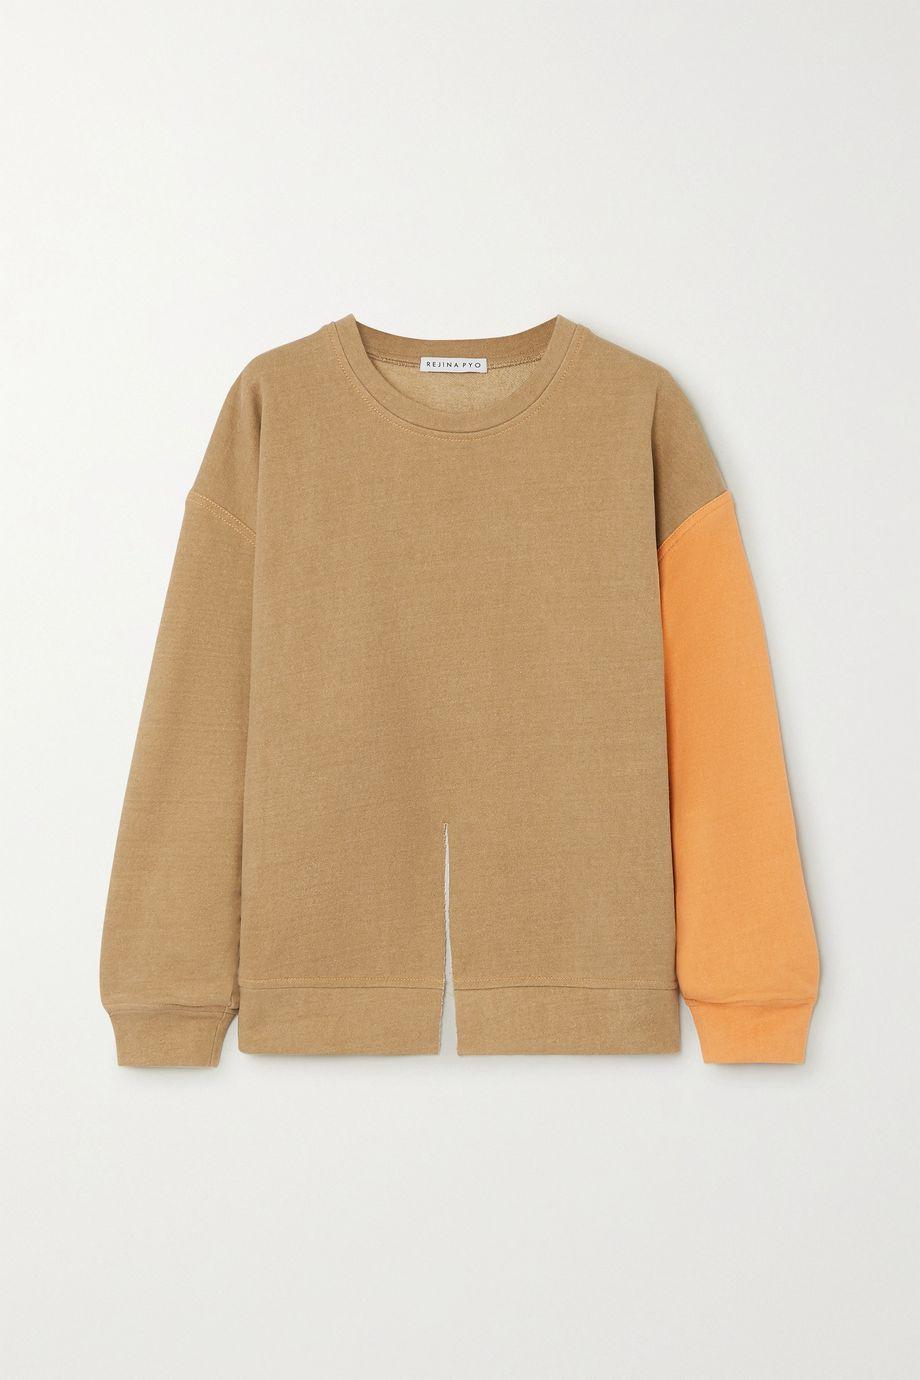 REJINA PYO Charlie two-tone cotton-jersey sweatshirt